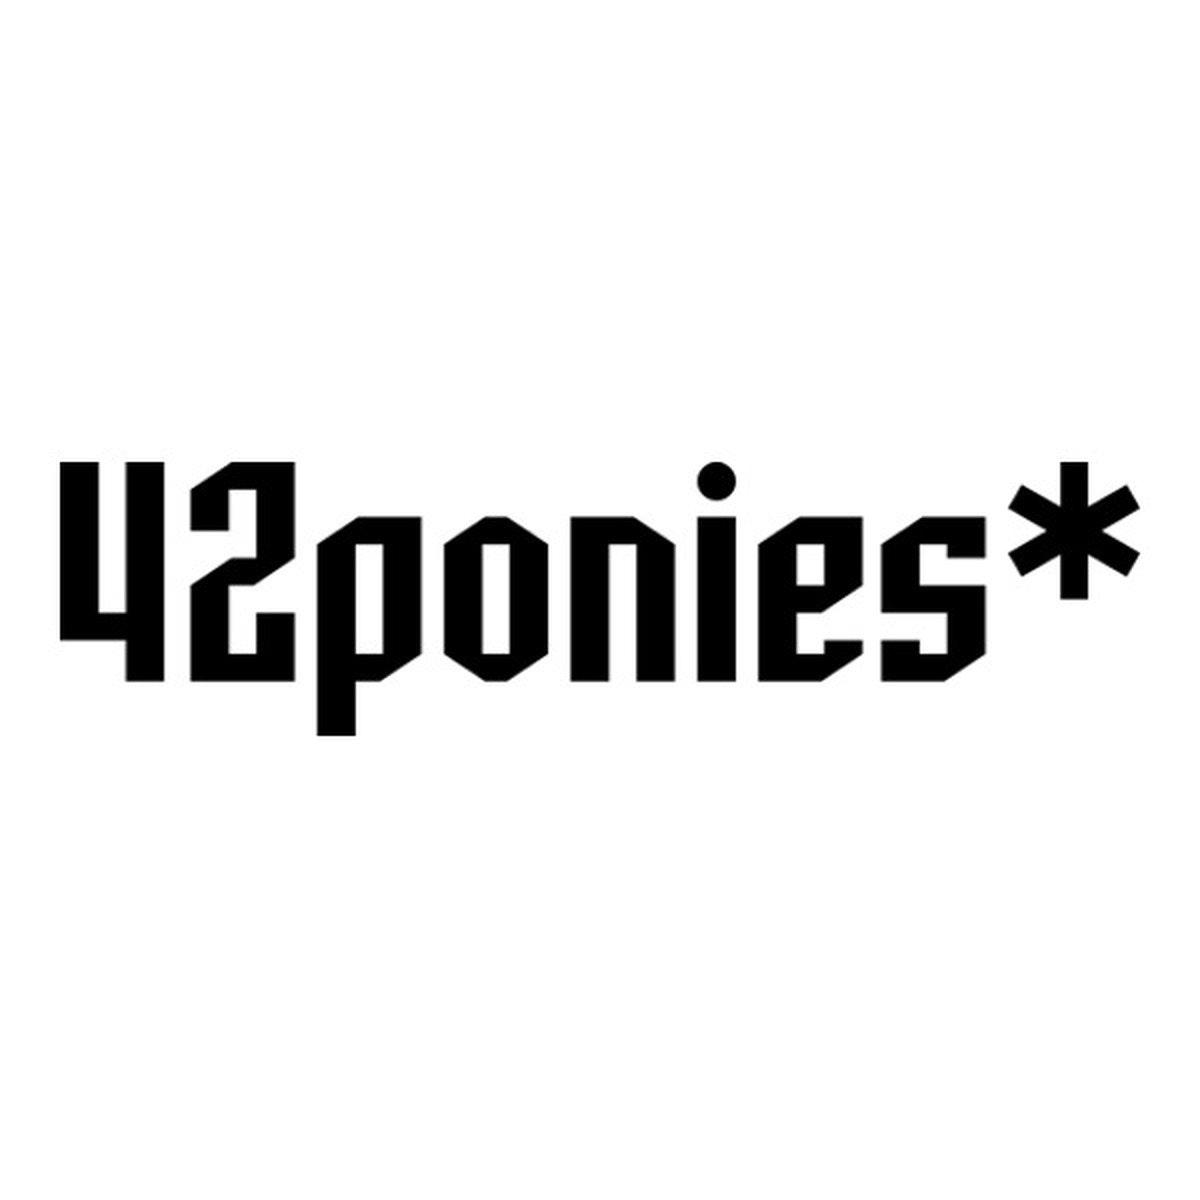 42ponies GmbH